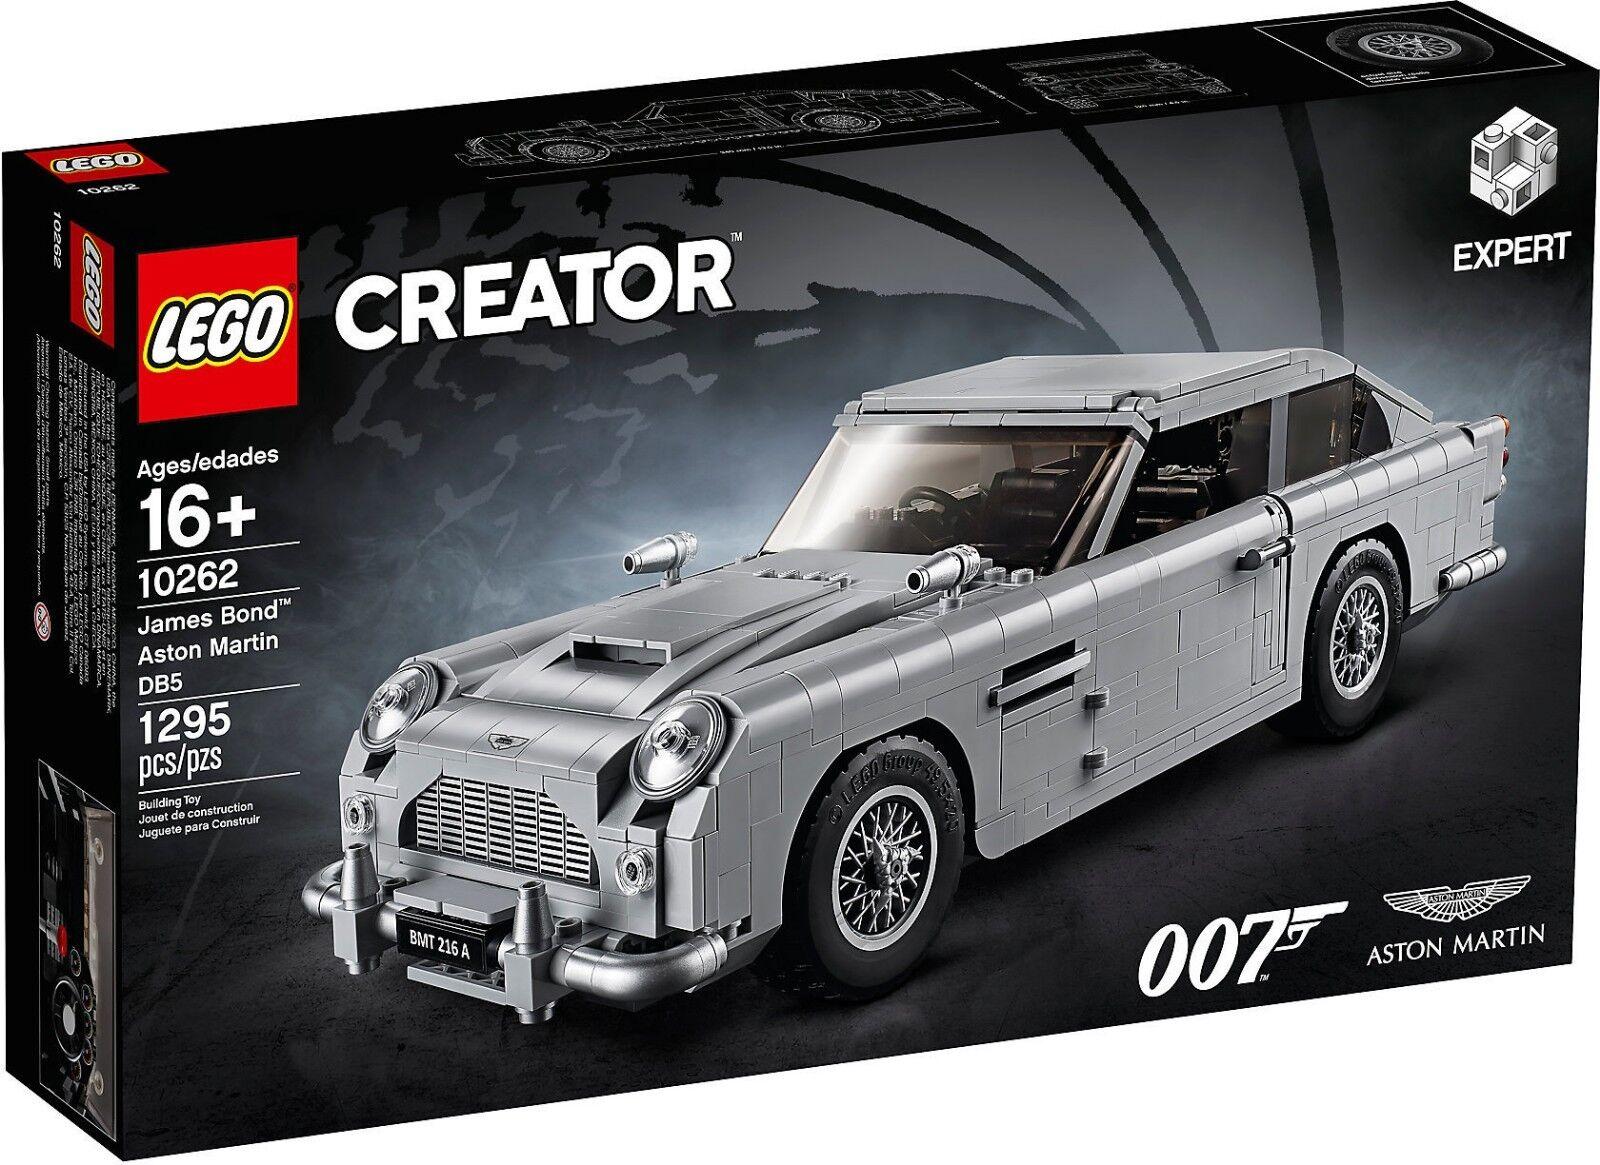 LEGO 10262 James Bond™ Aston Martin Martin Martin DB5 Expert 16 Pz 1295 8835f2